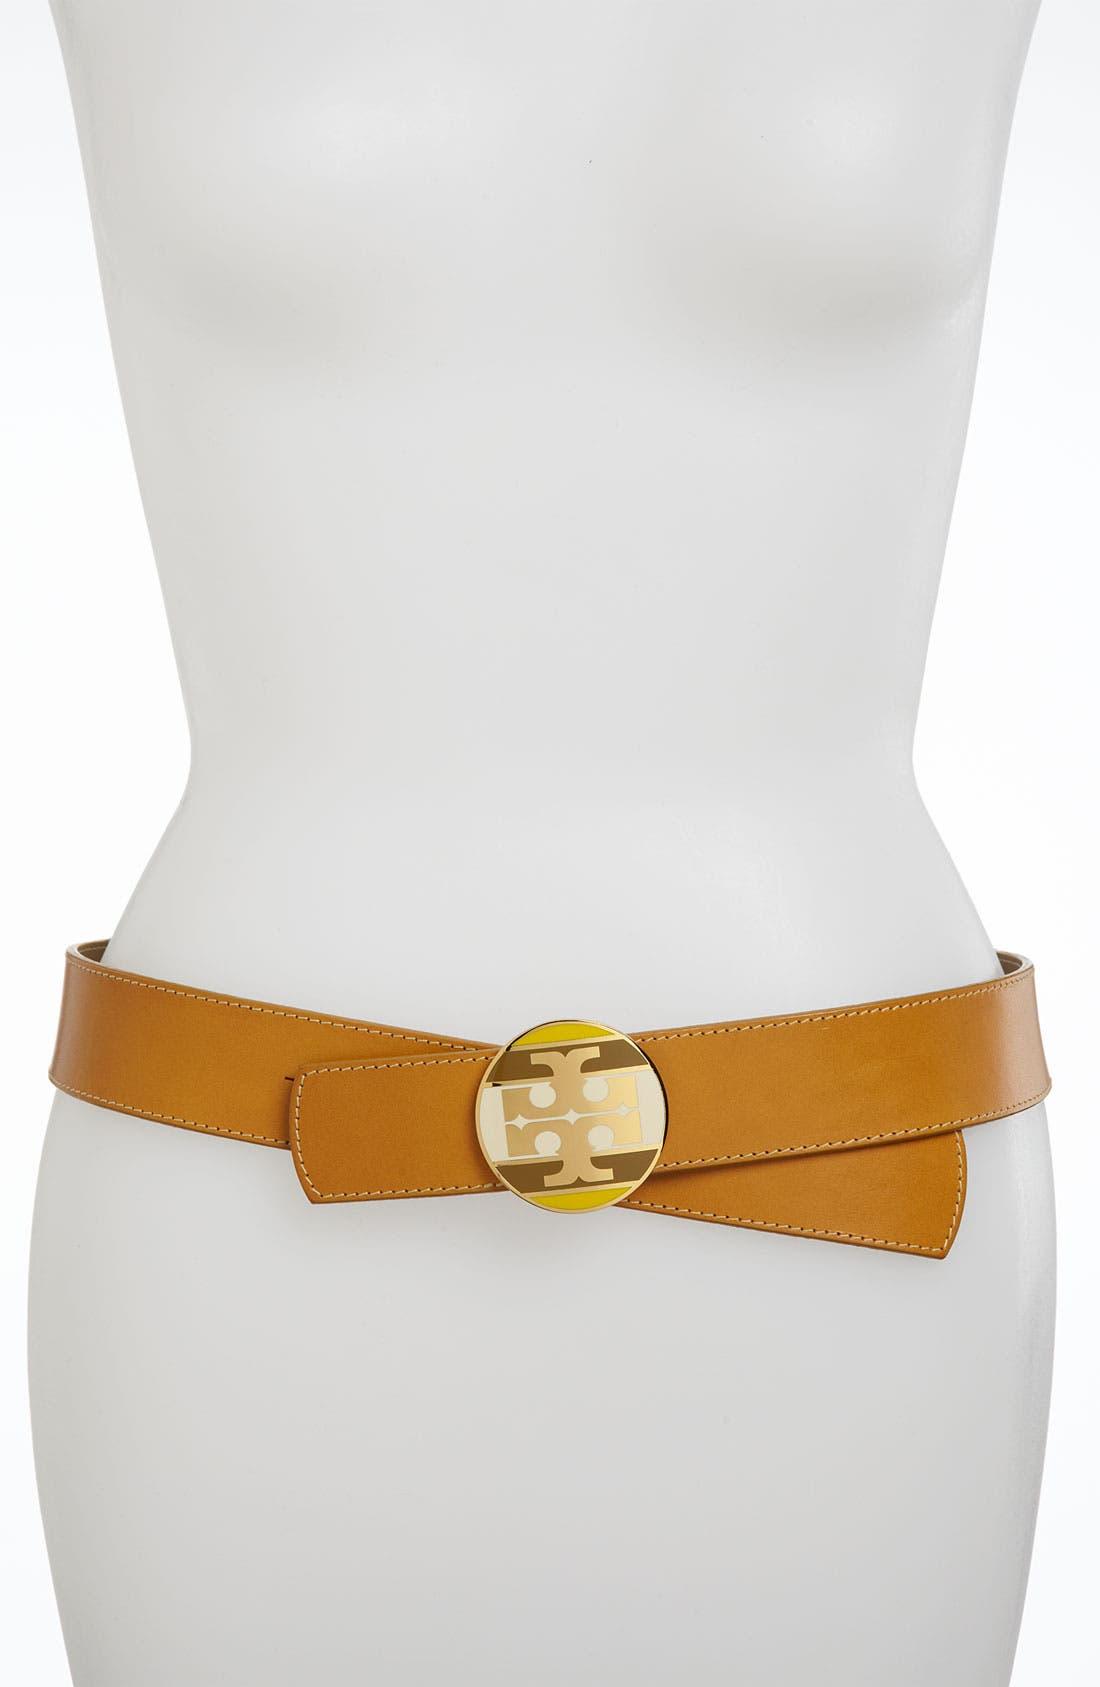 Main Image - Tory Burch Reversible Belt